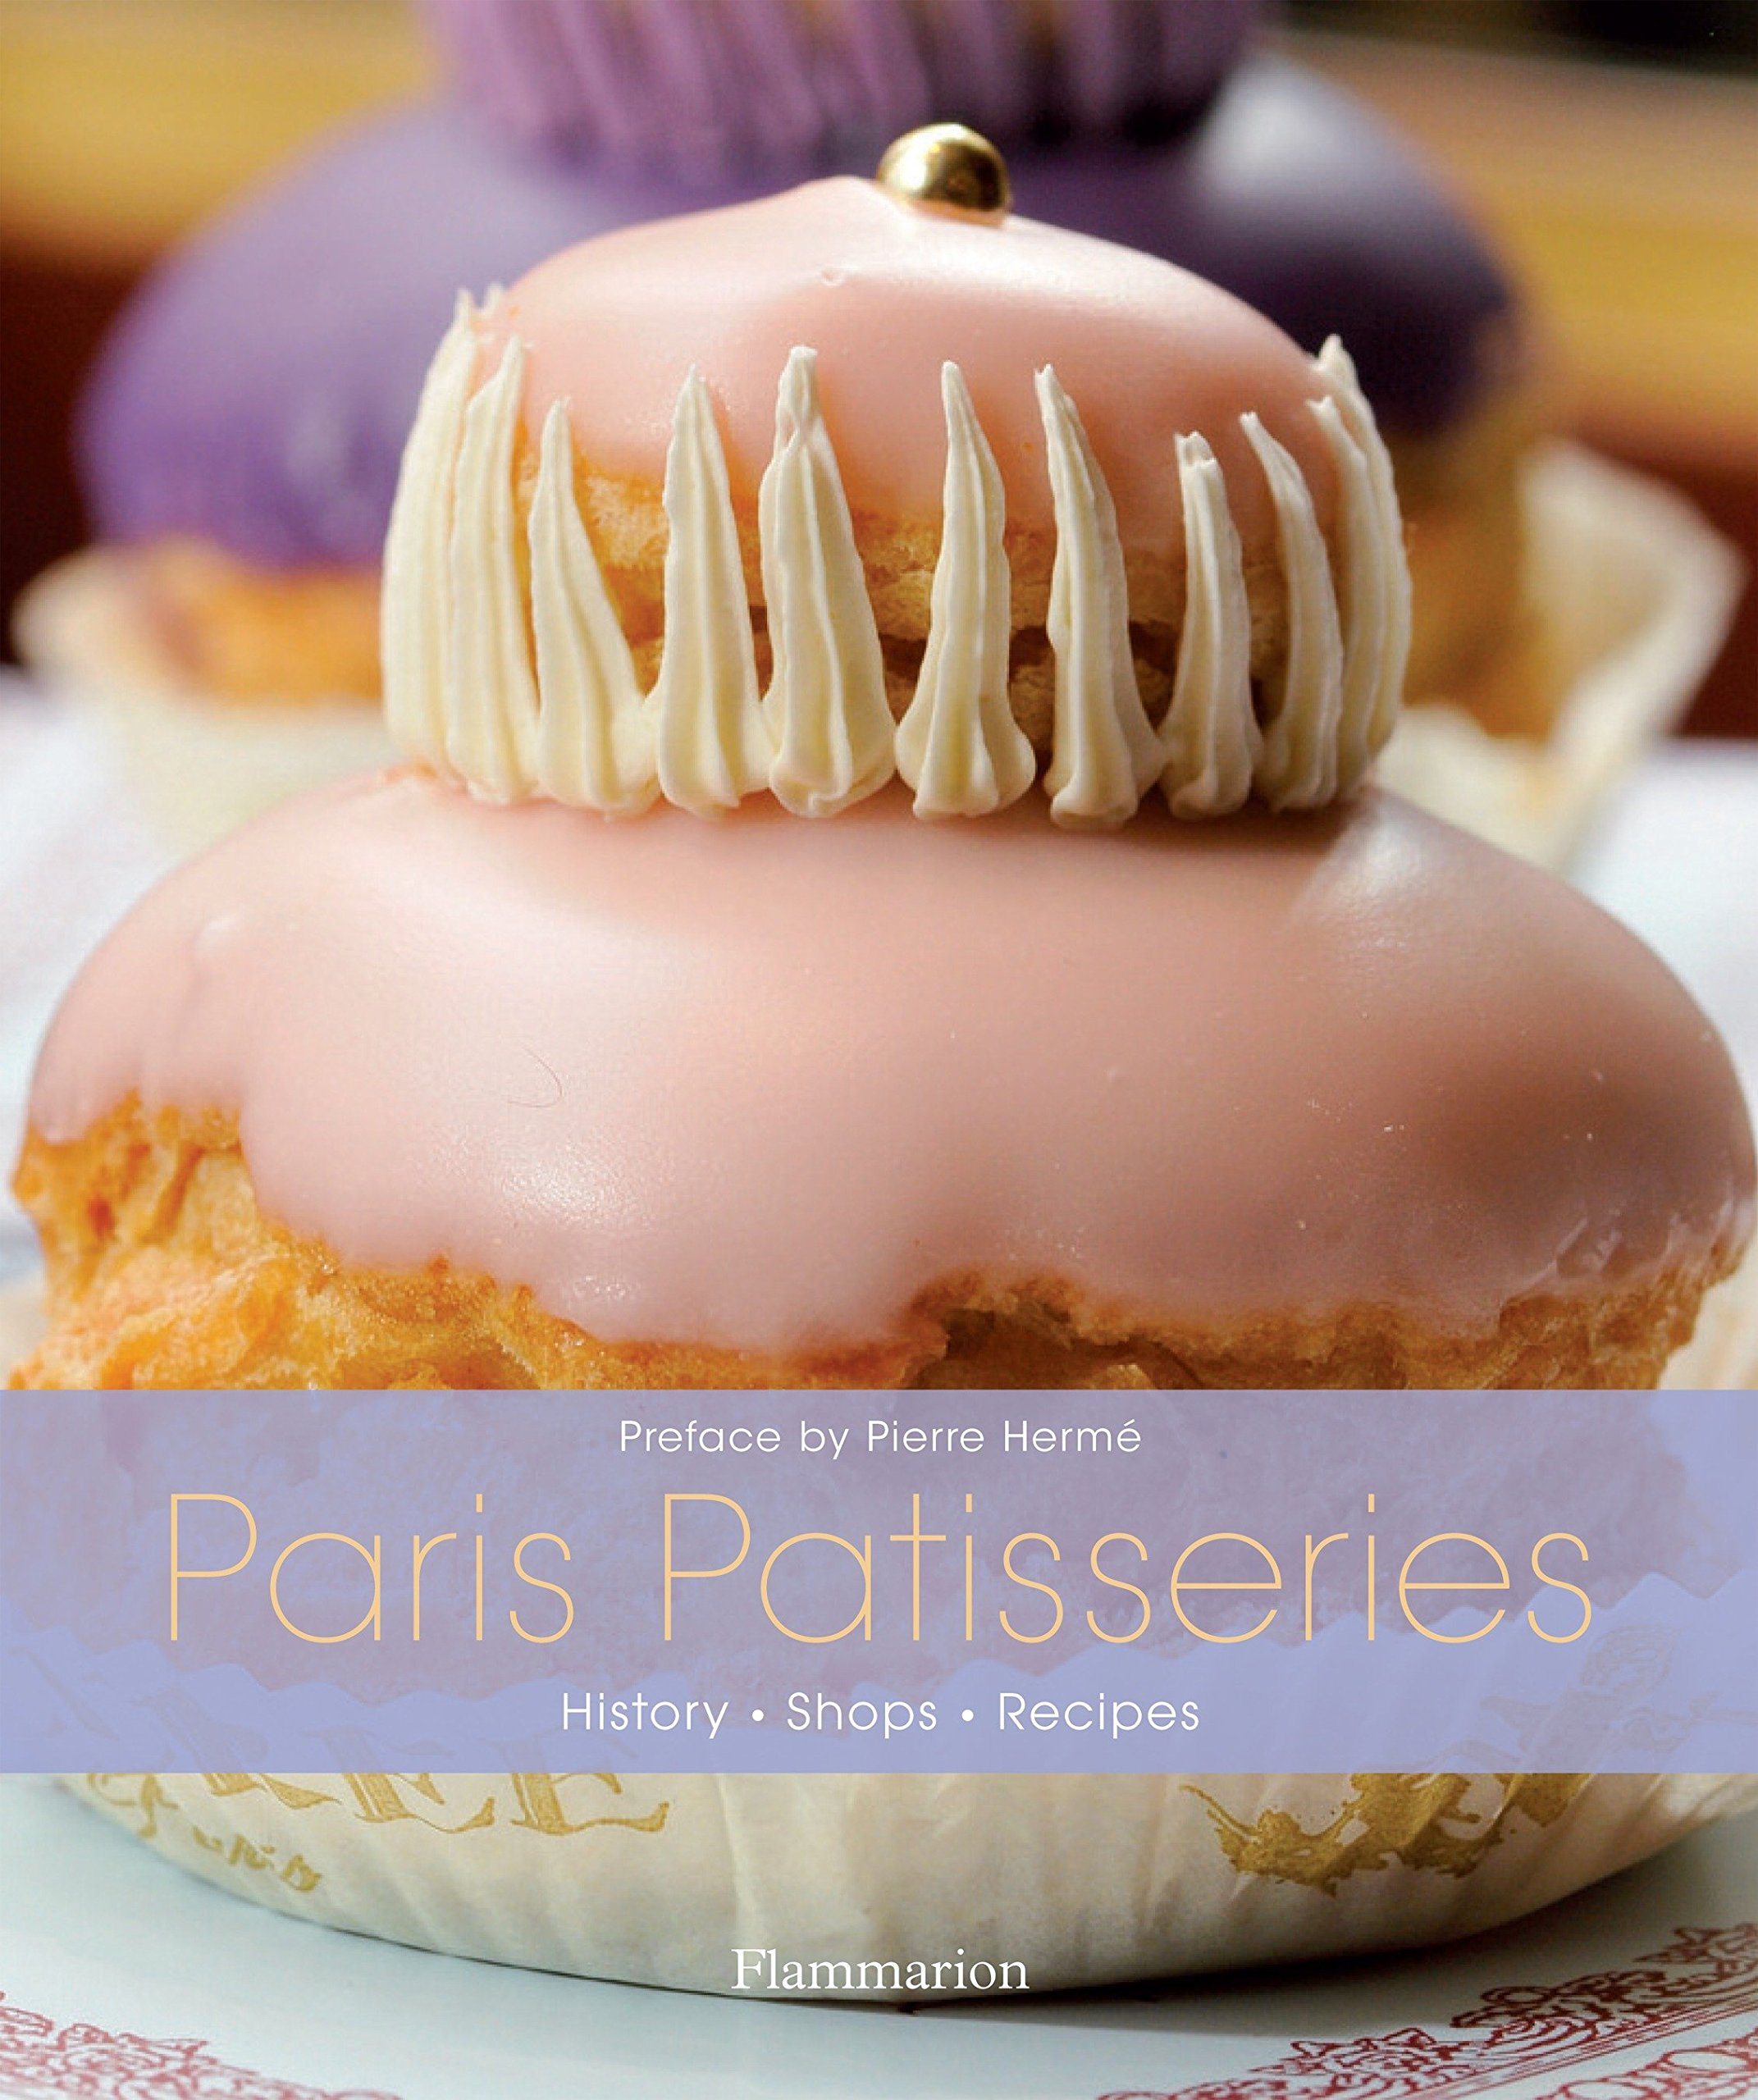 Paris Patisseries: History, Shops, Recipes by Flammarion-Pere Castor